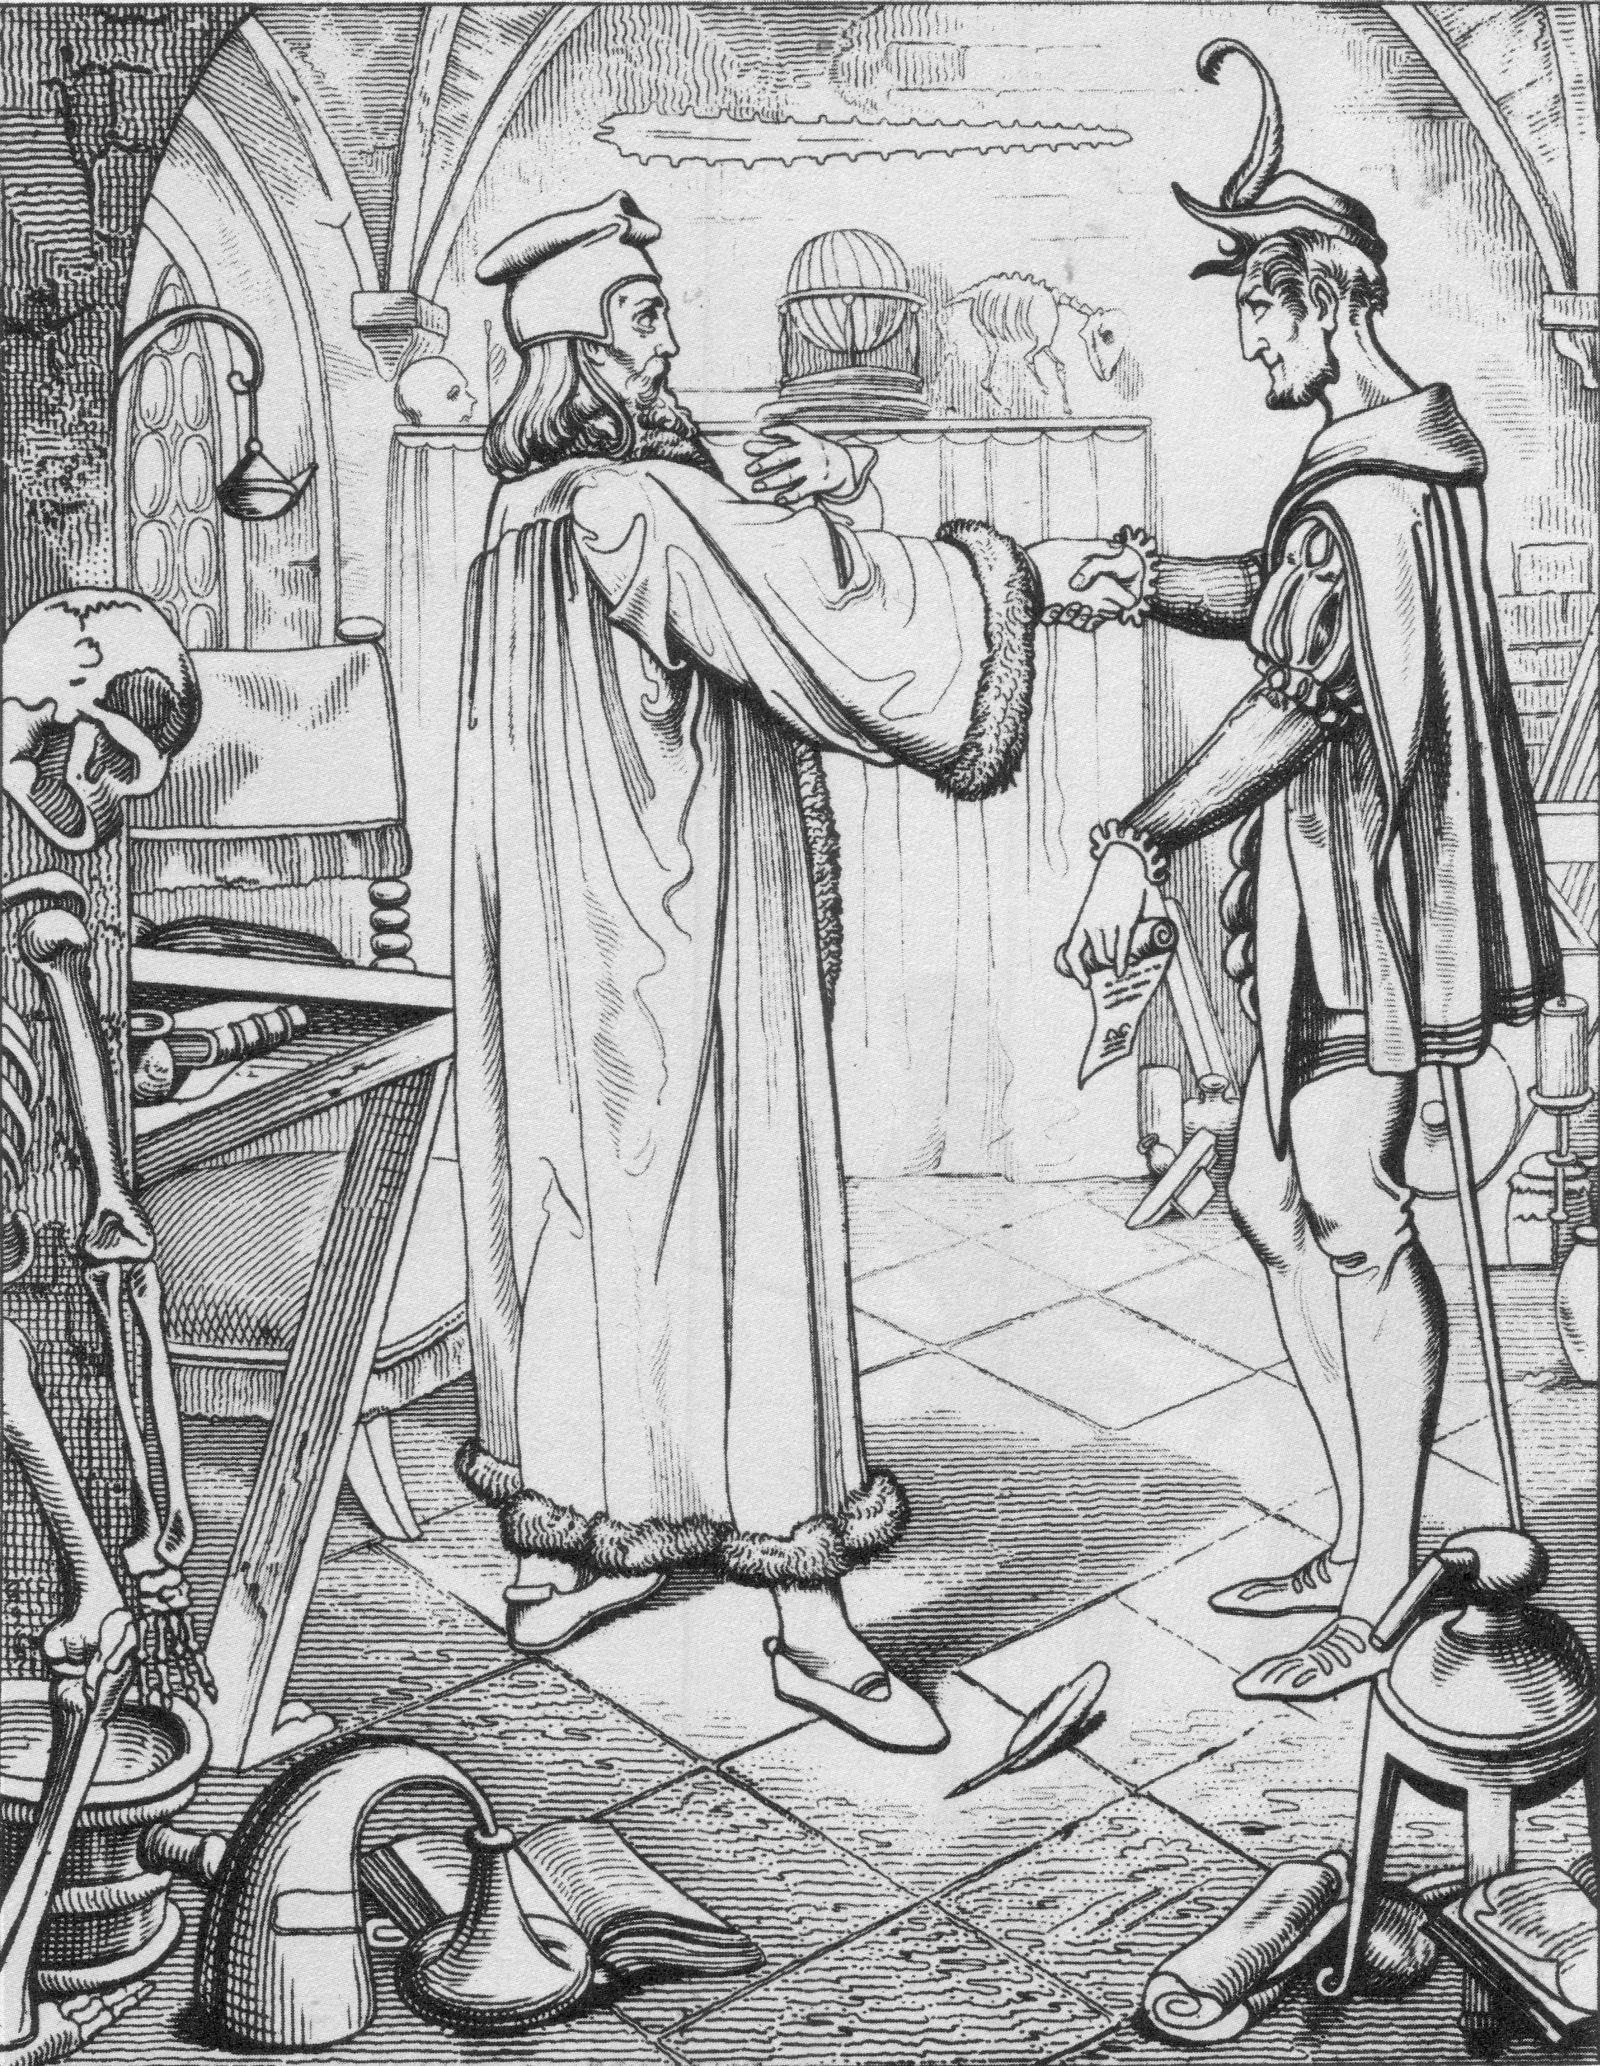 Faust I Studierzimmer 2 Der Teufelspakt Goethe